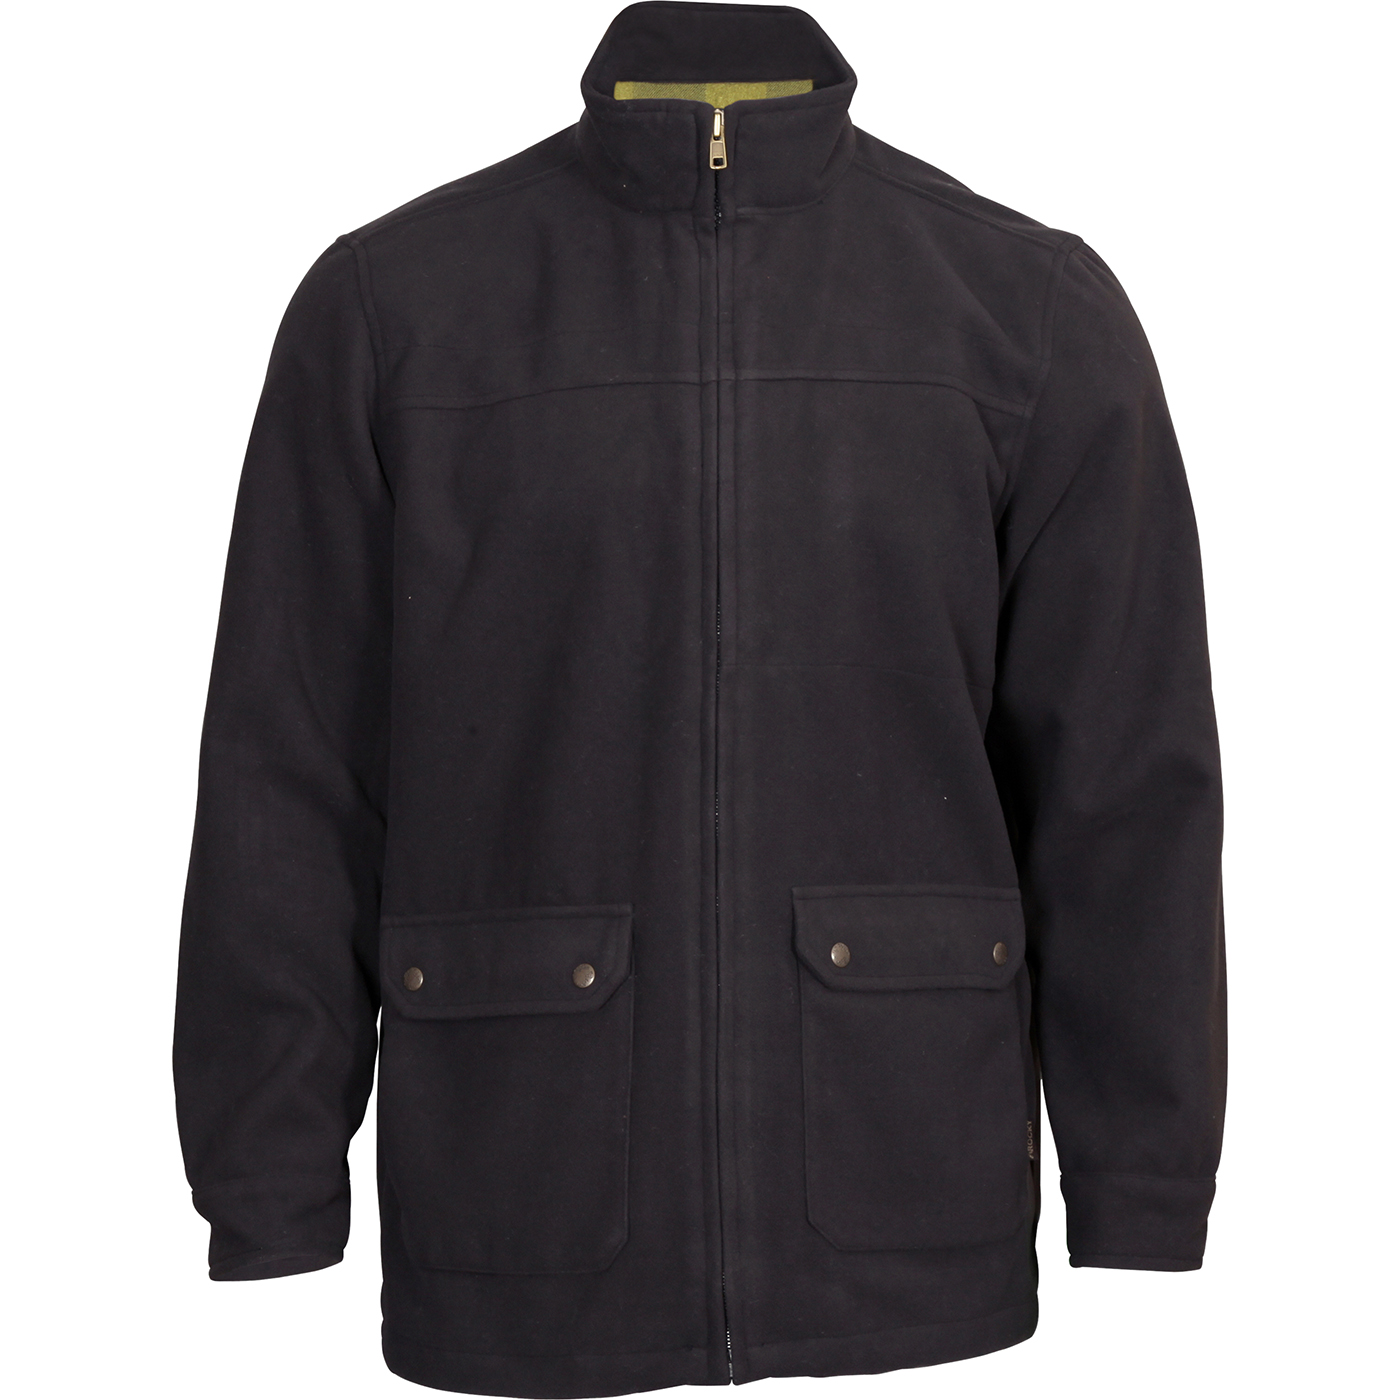 lined deere brown men s mens coats jackets m accessories flannel coat clothing jacket work barn john barns c shoes